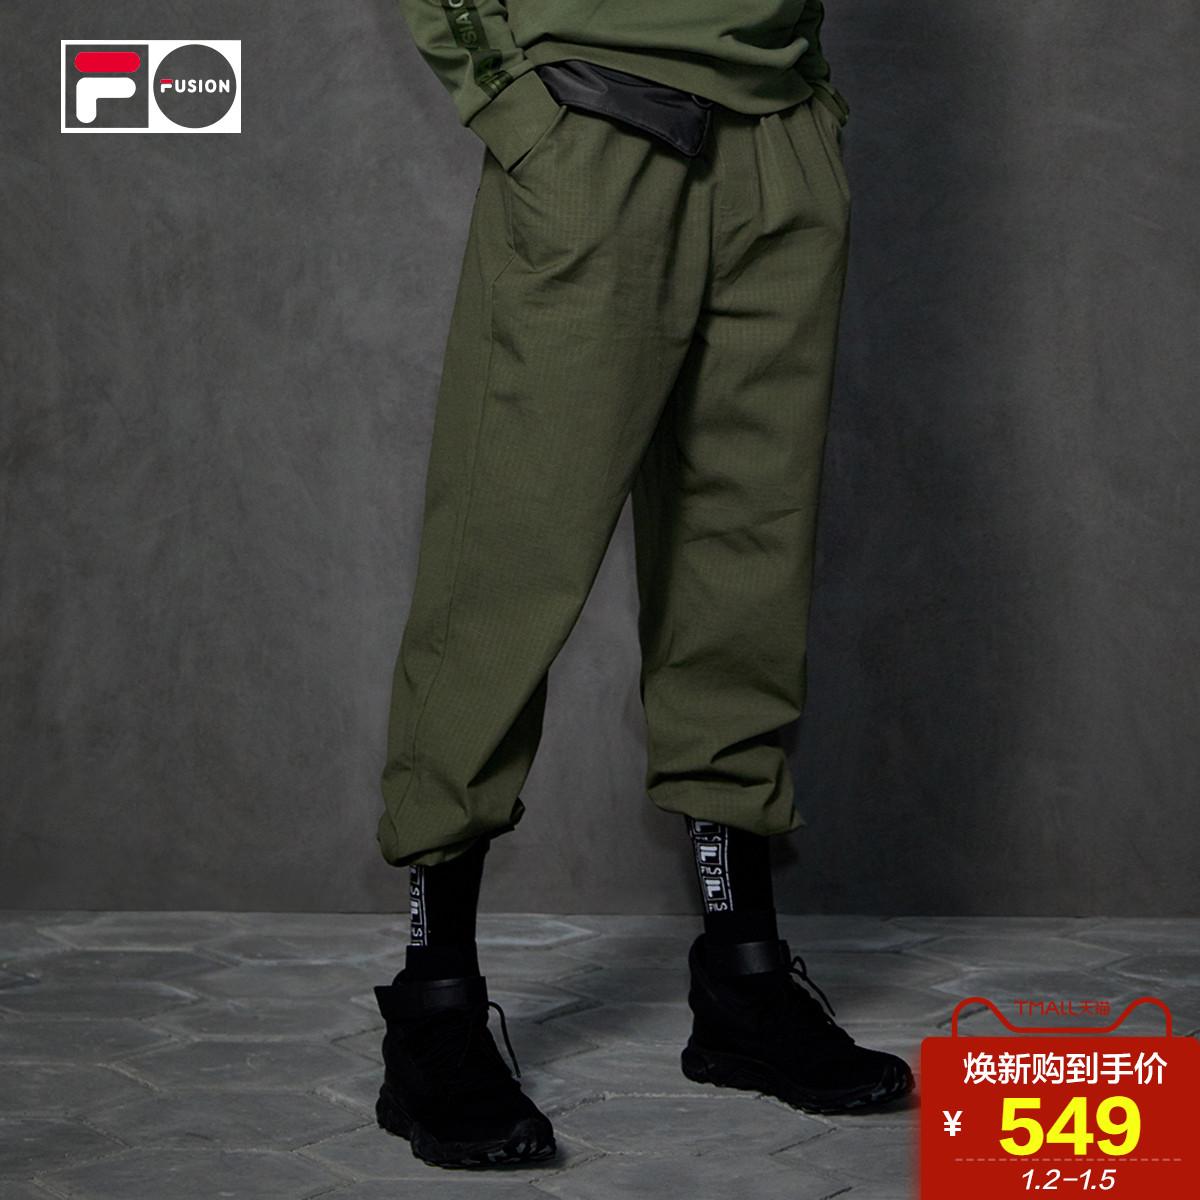 FILA FUSION斐乐男长裤2019春季新品运动休闲街头时尚梭织长裤男